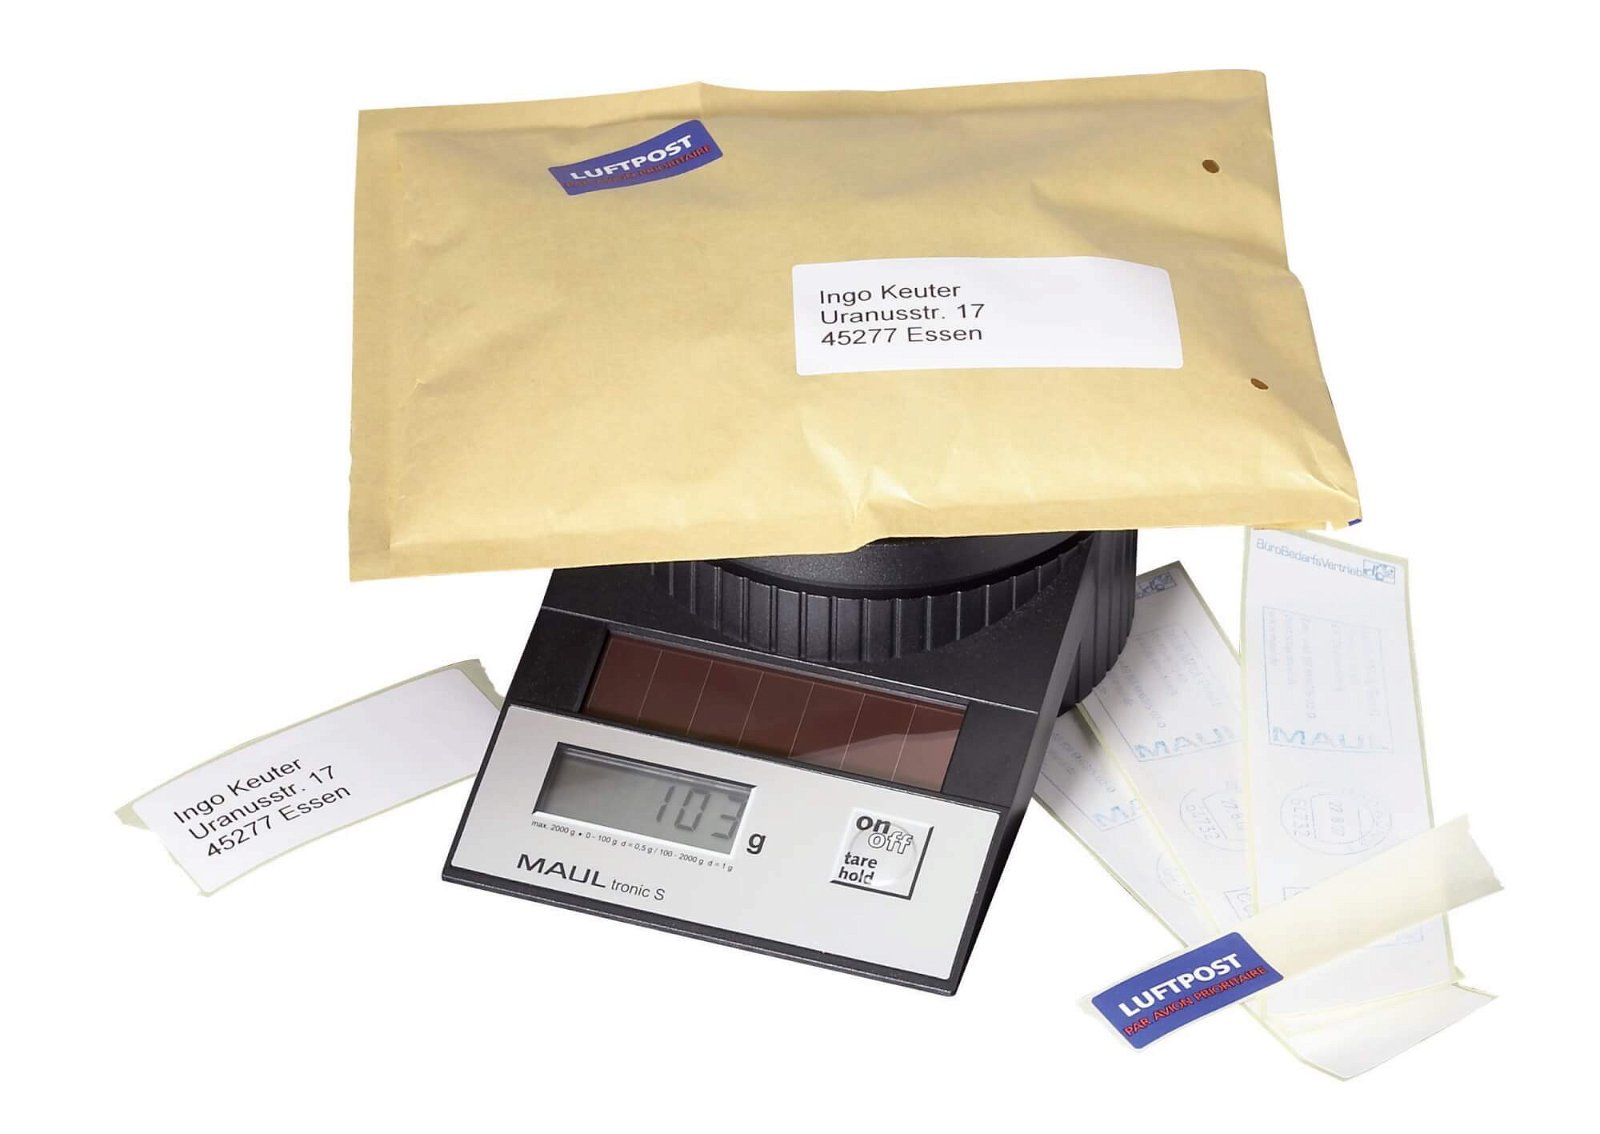 Solar-Briefwaage MAULtronic S, 2000 g, schwarz